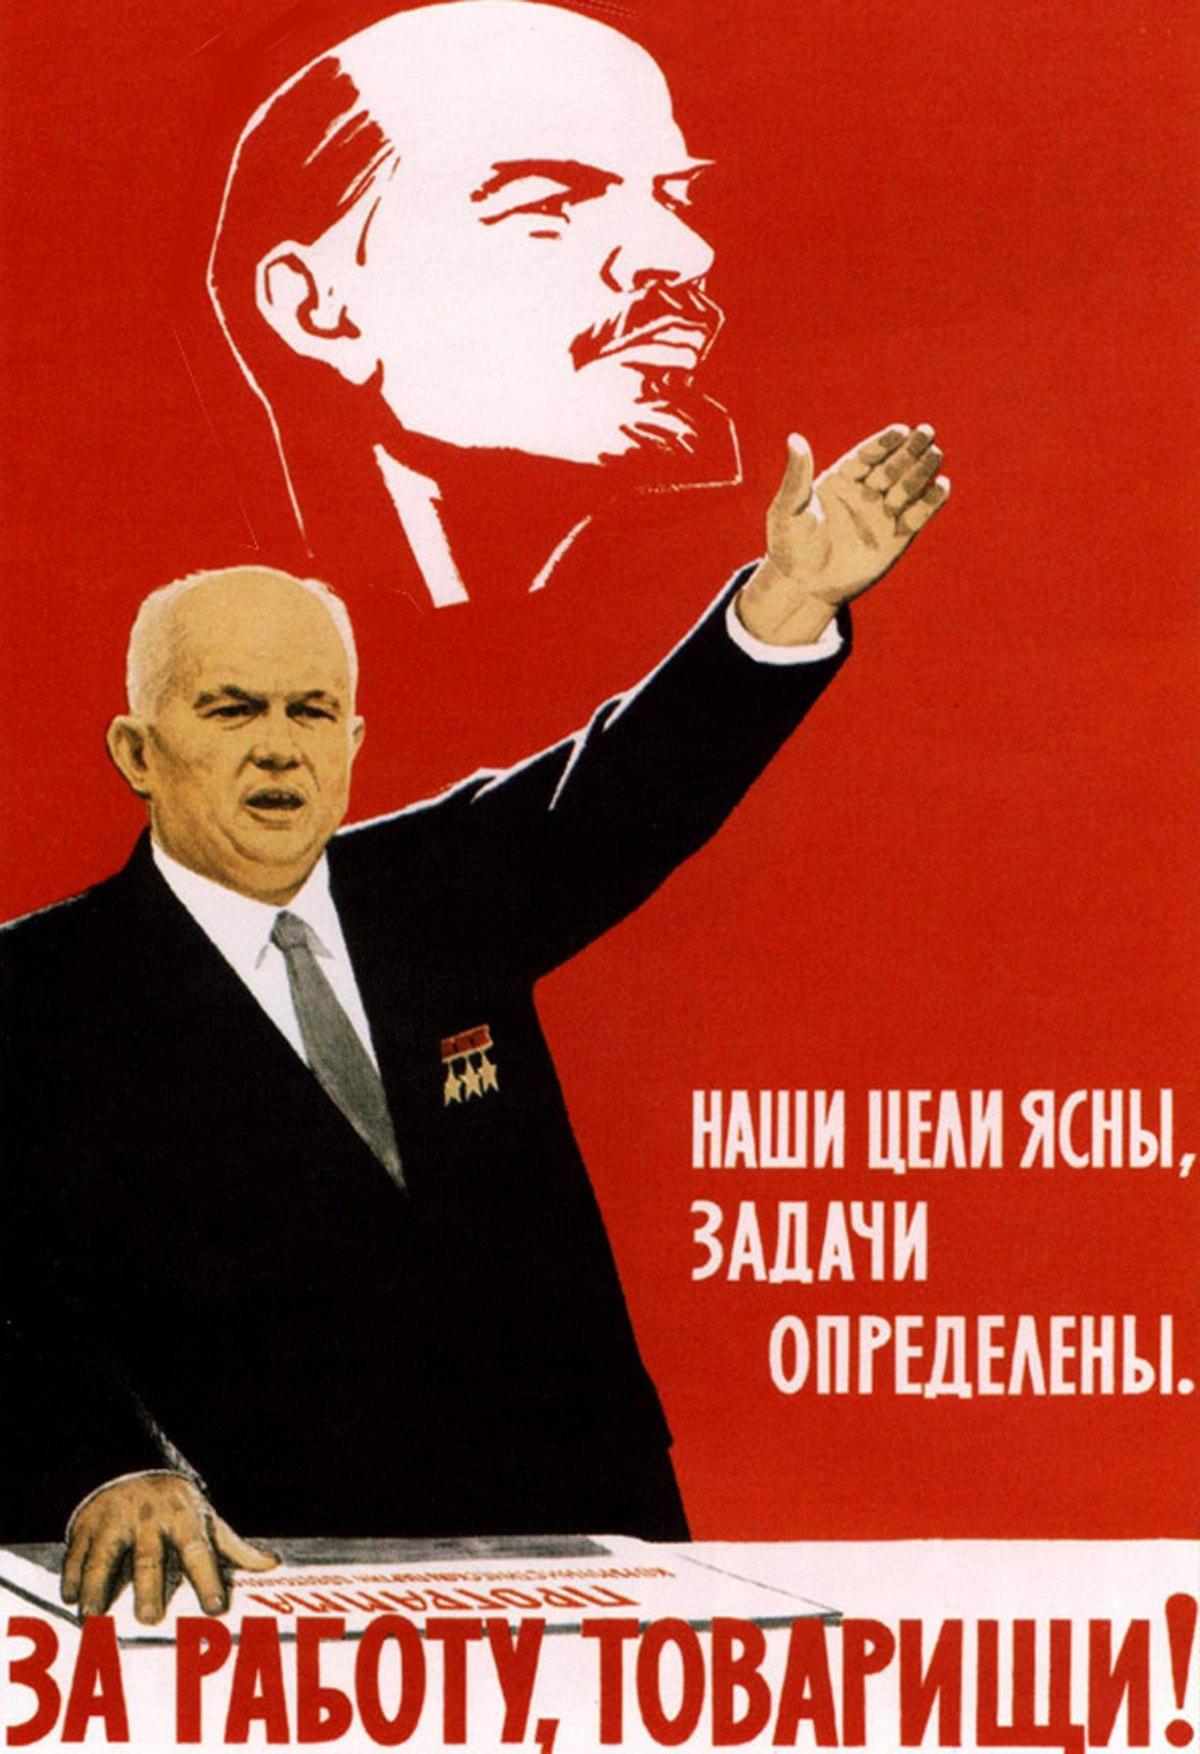 Агитационный плакат.